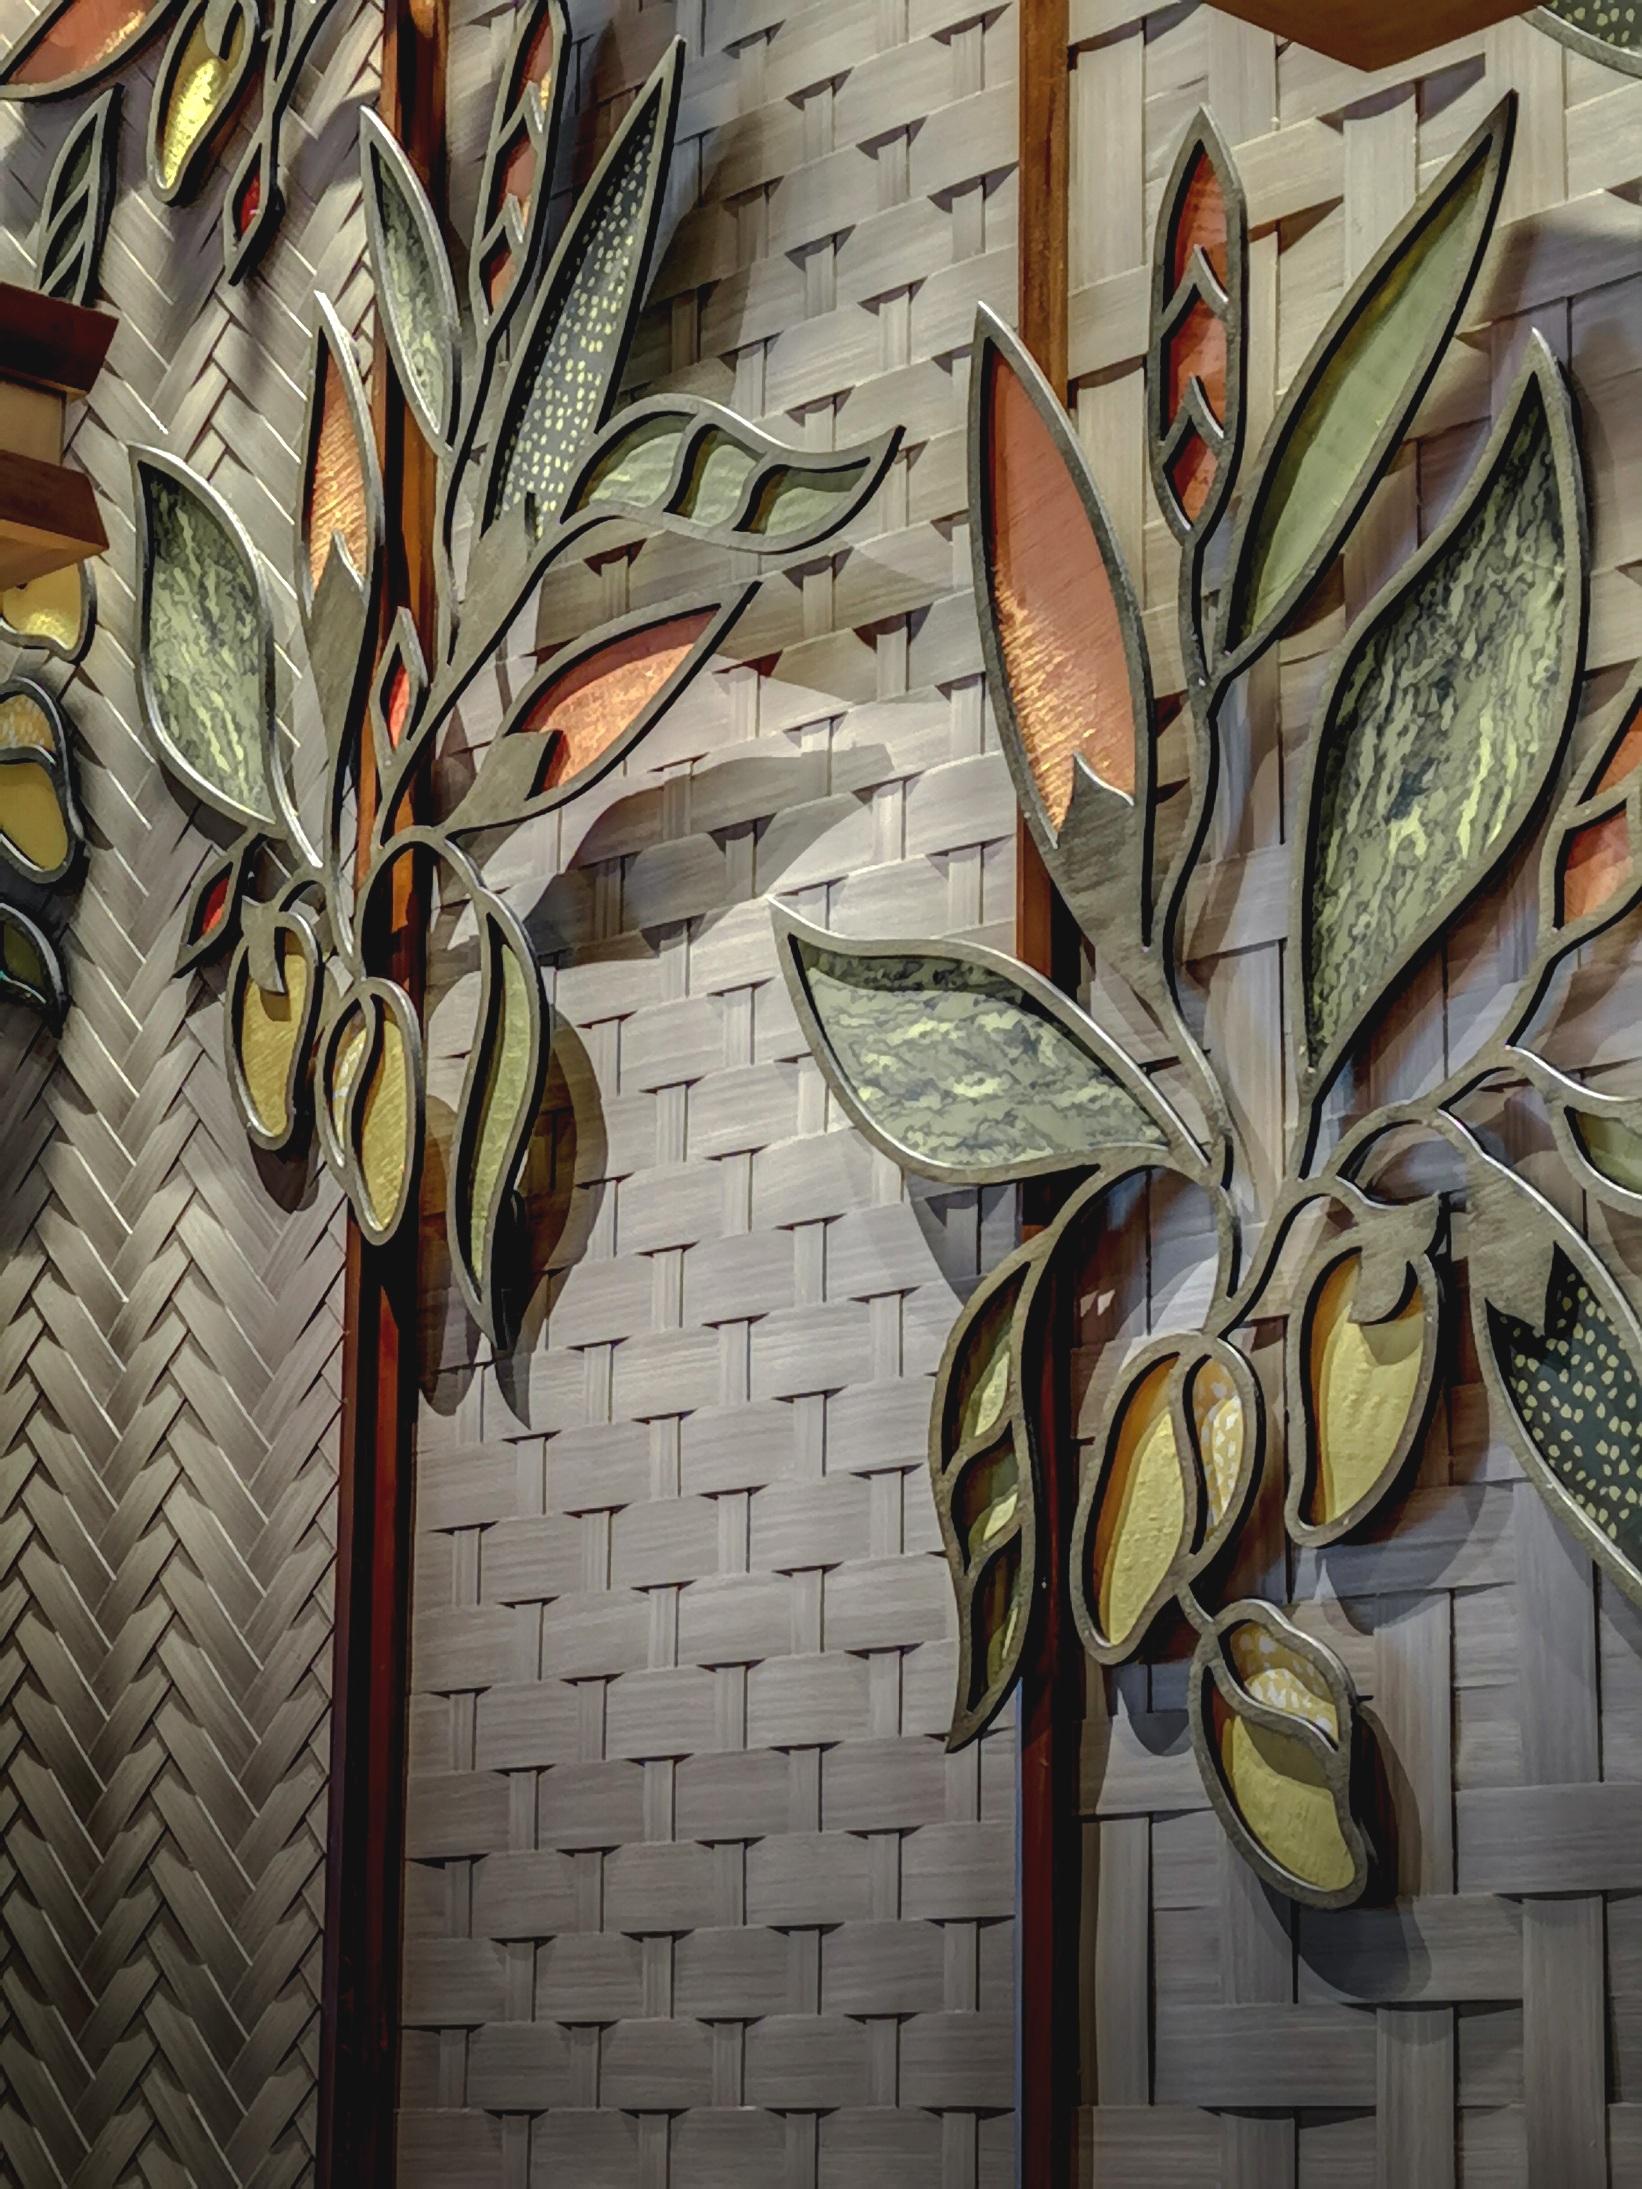 Mango+Tree+Wall+Relief+Details.jpg